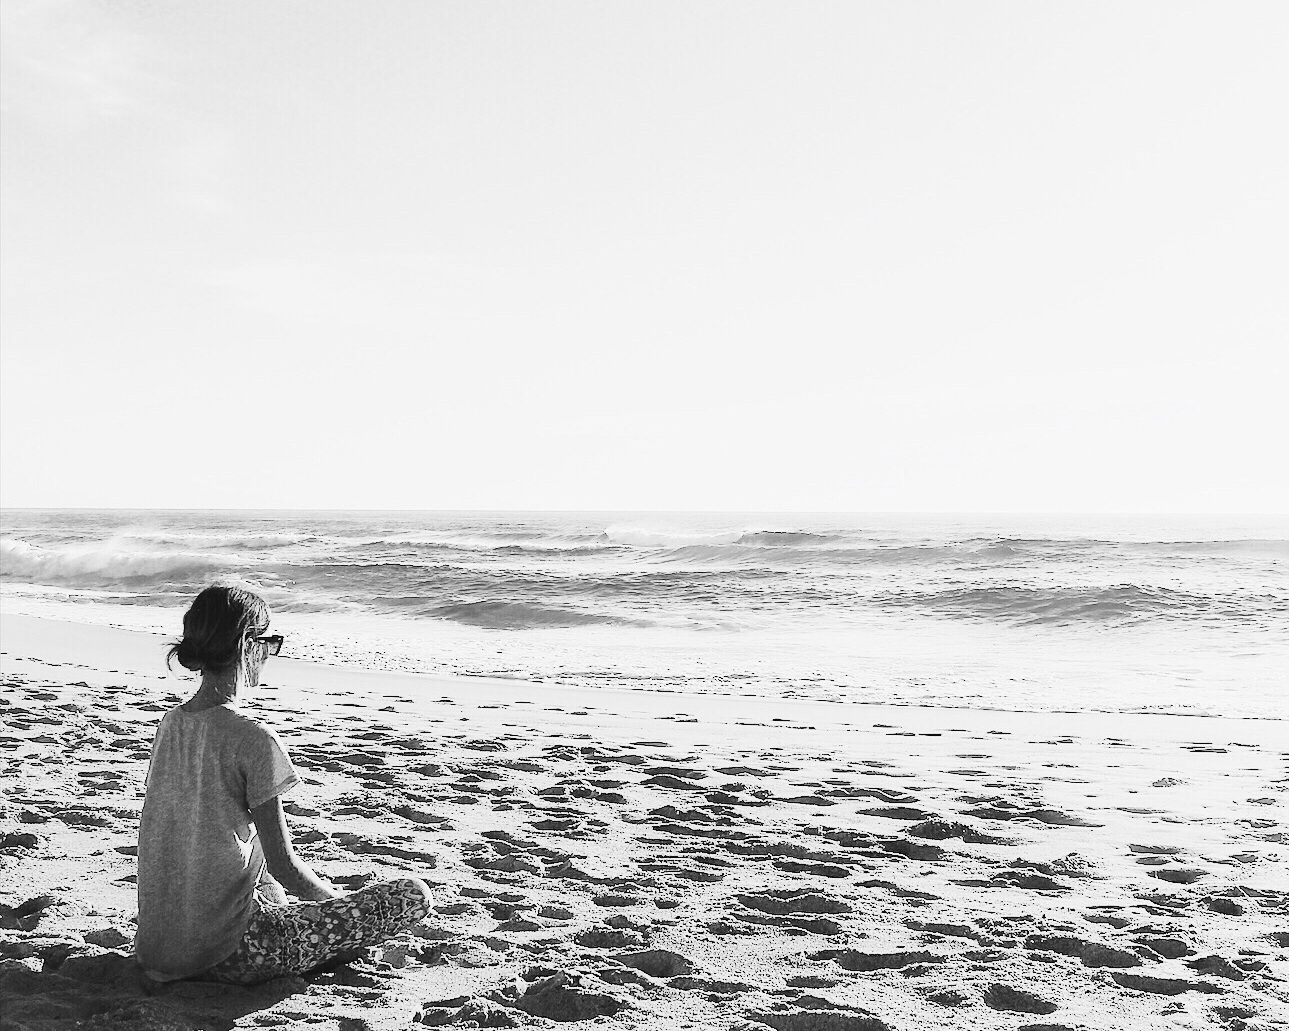 Boomerang Beach, NSW, Australia